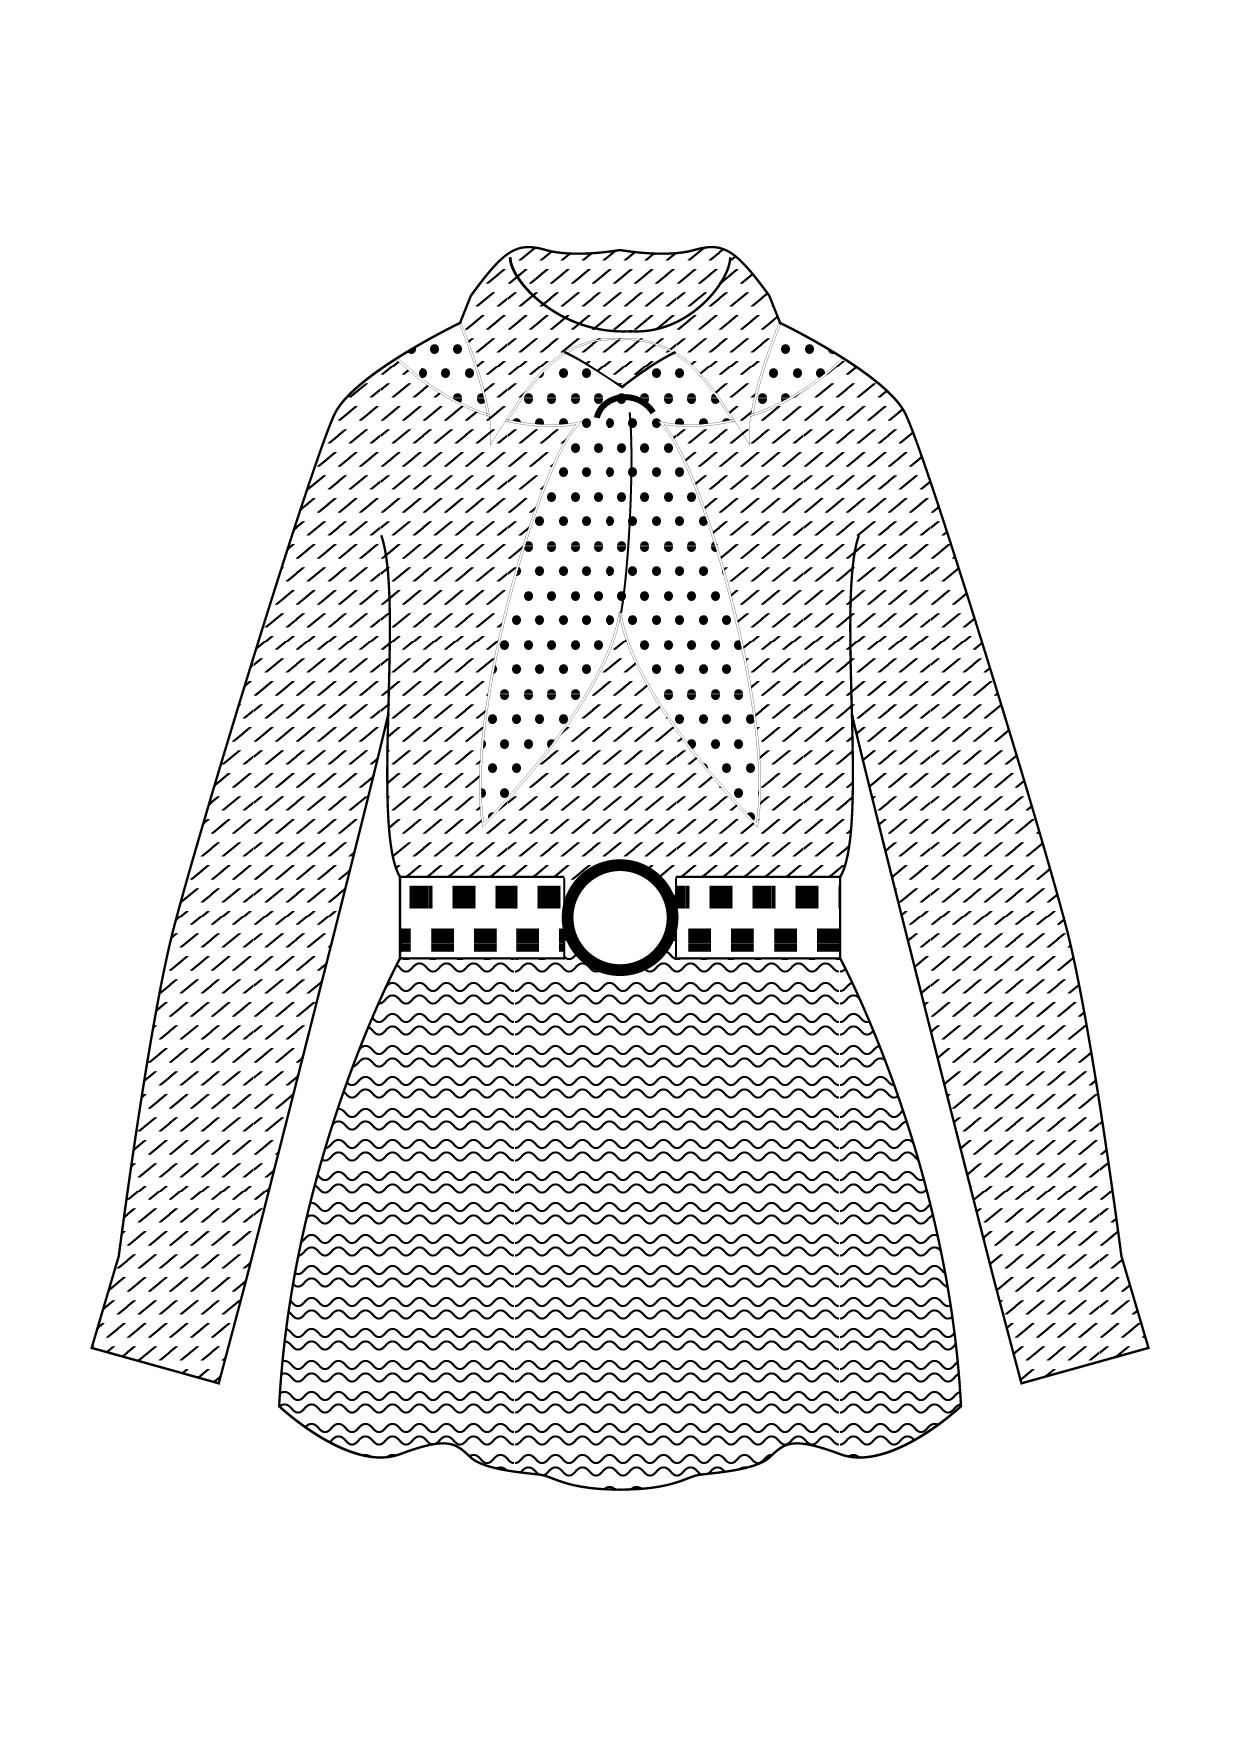 pioneer's uniform